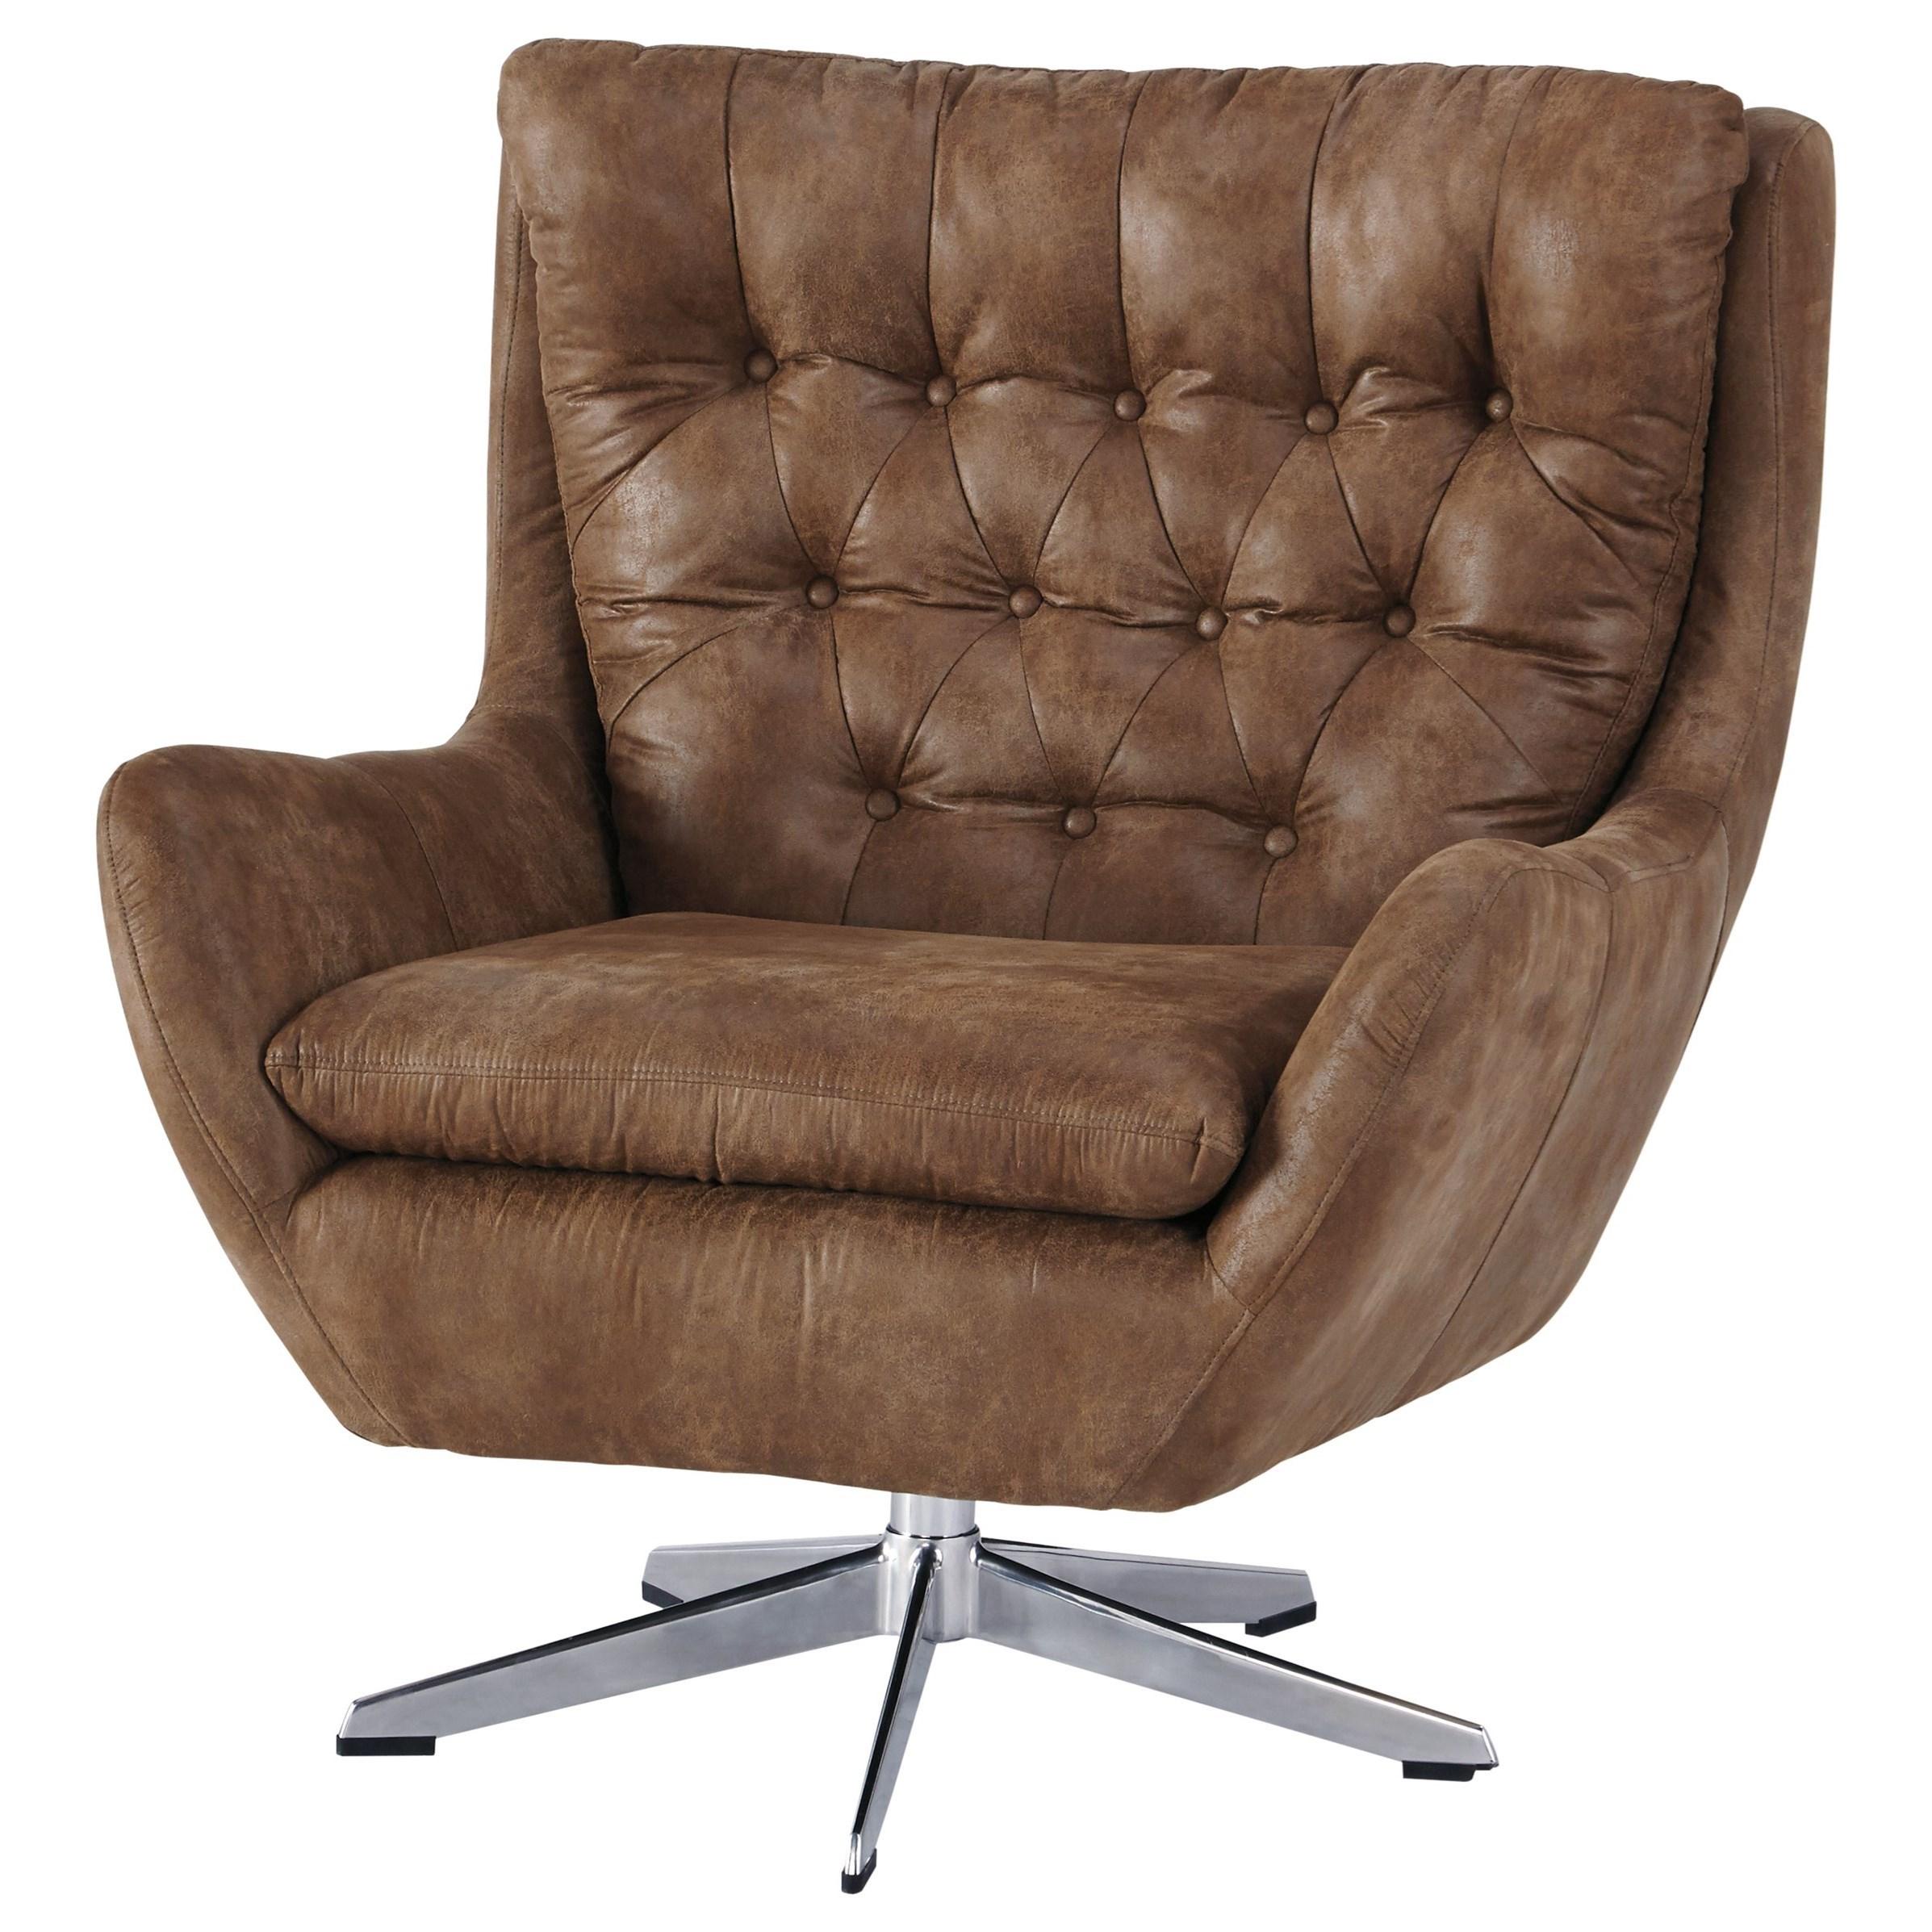 Brilliant Ashley Furniture Armchair Brookerpalmtrees Creativecarmelina Interior Chair Design Creativecarmelinacom